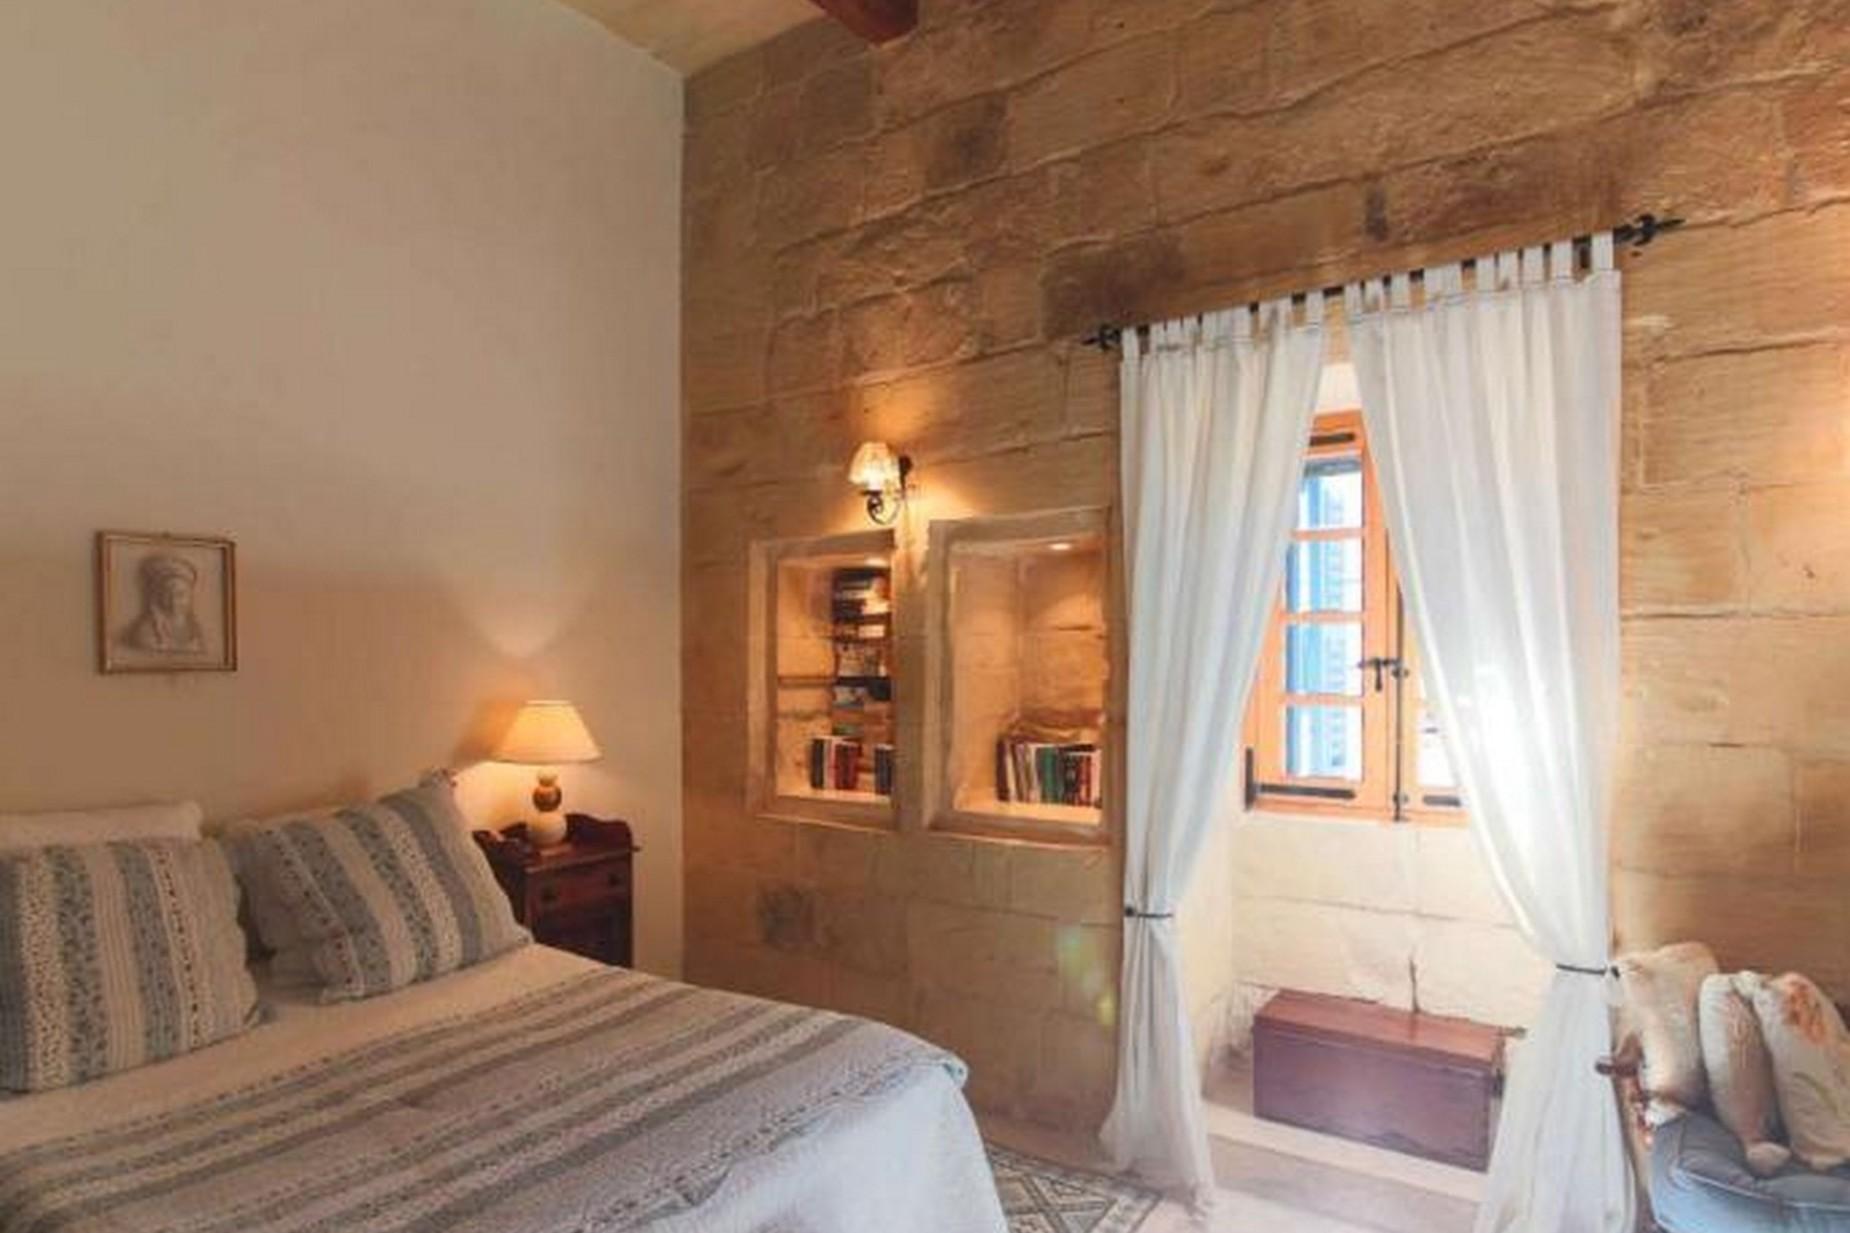 4 bed House of Character For Rent in Birkirkara, Birkirkara - thumb 9